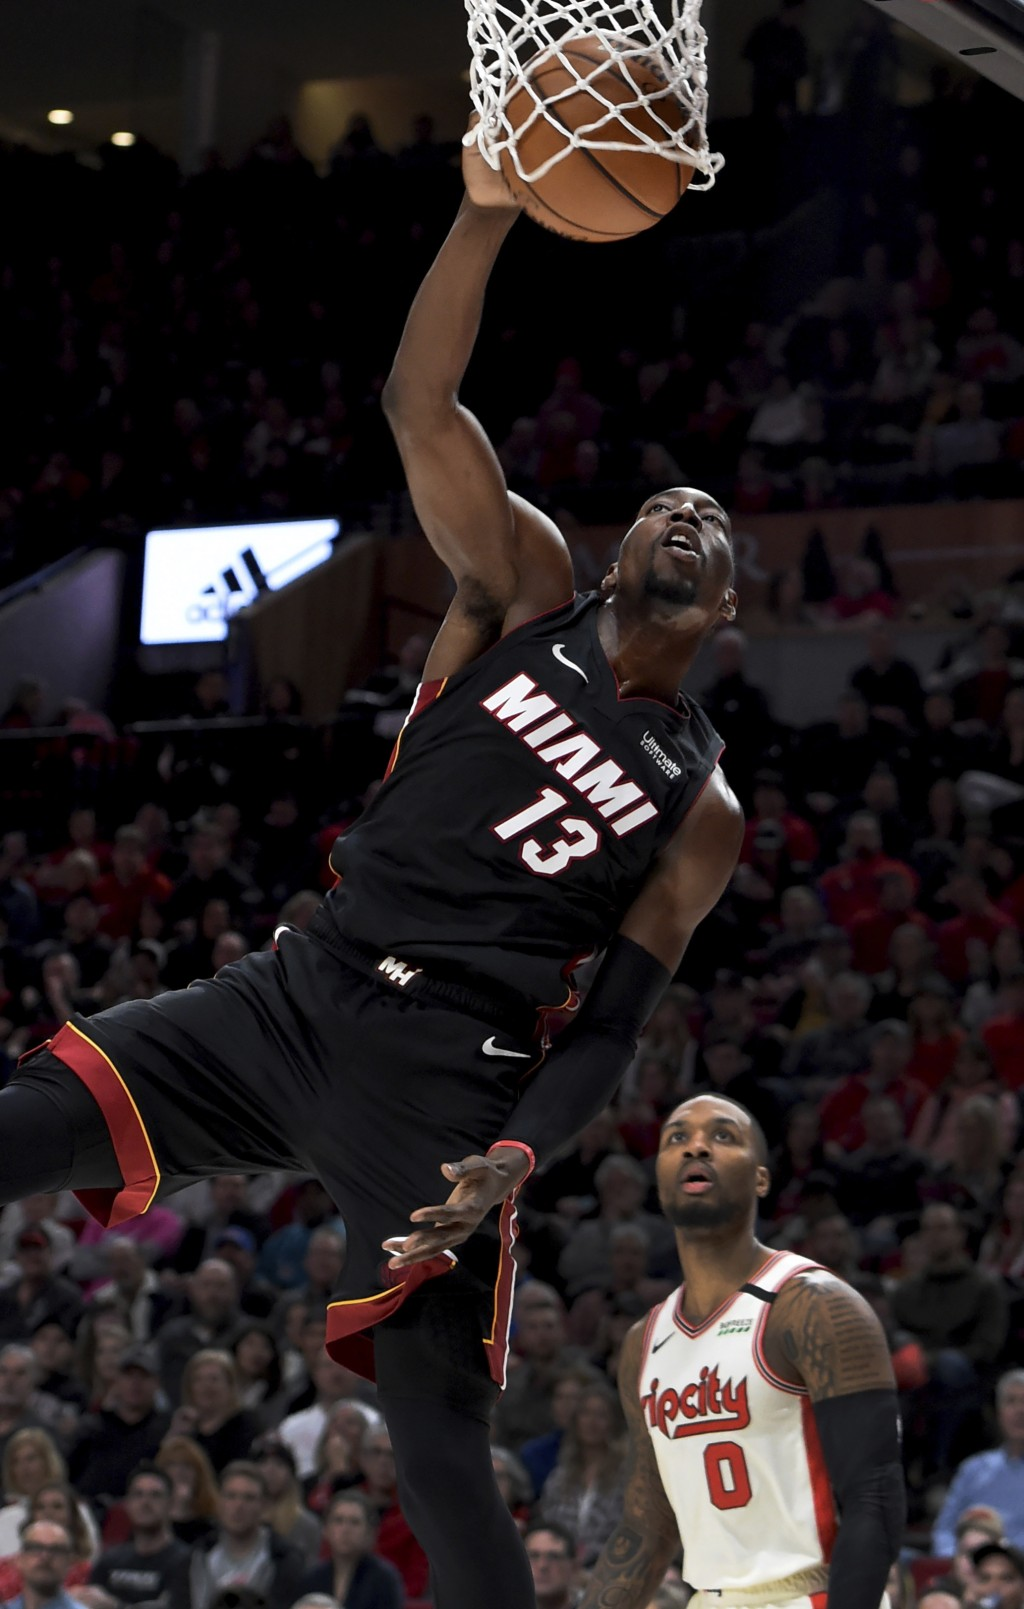 Miami Heat forward Bam Adebayo, left, dunks the ball as Portland Trail Blazers guard Damian Lillard, right, looks on during the first half of an NBA b...